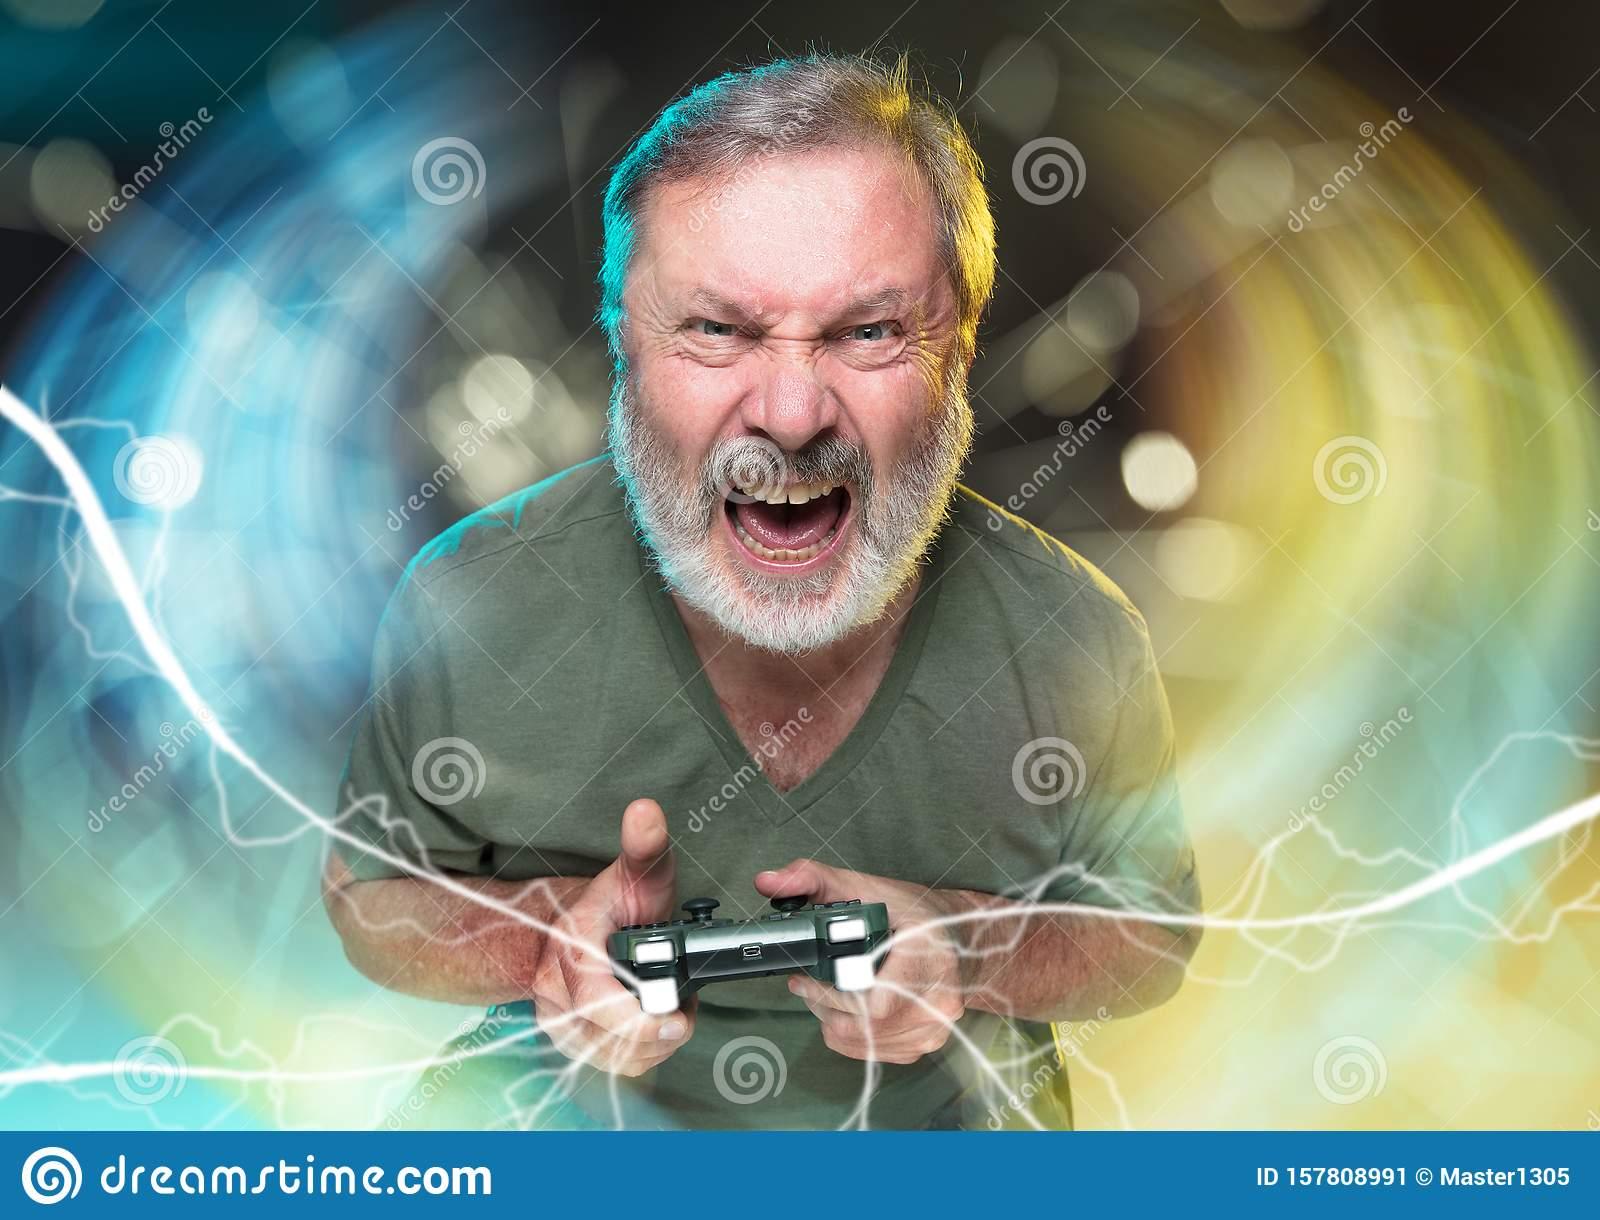 enthusiastic-gamer-joyful-man-holding-video-game-controller-breathtaking-new-life-senior-man-holding-video-game-controller